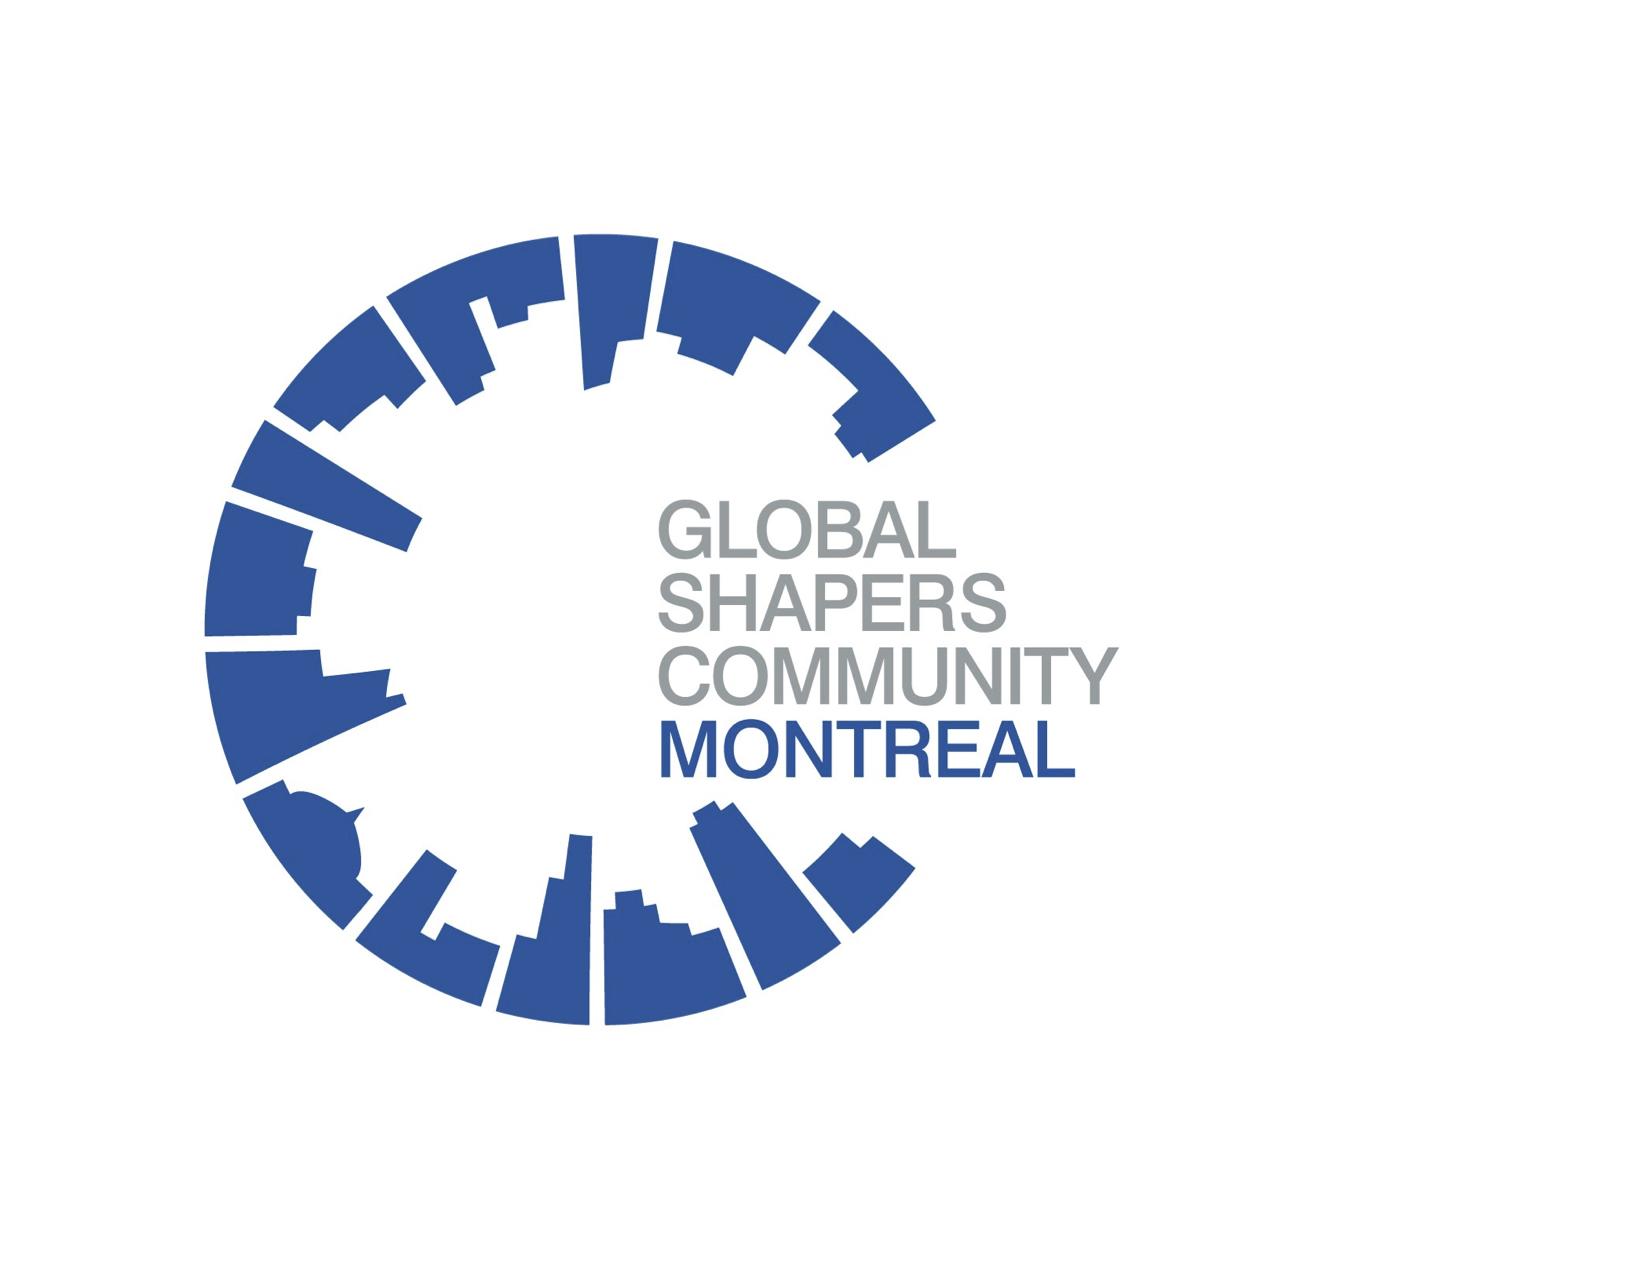 global-shapers-community-montreal.jpg